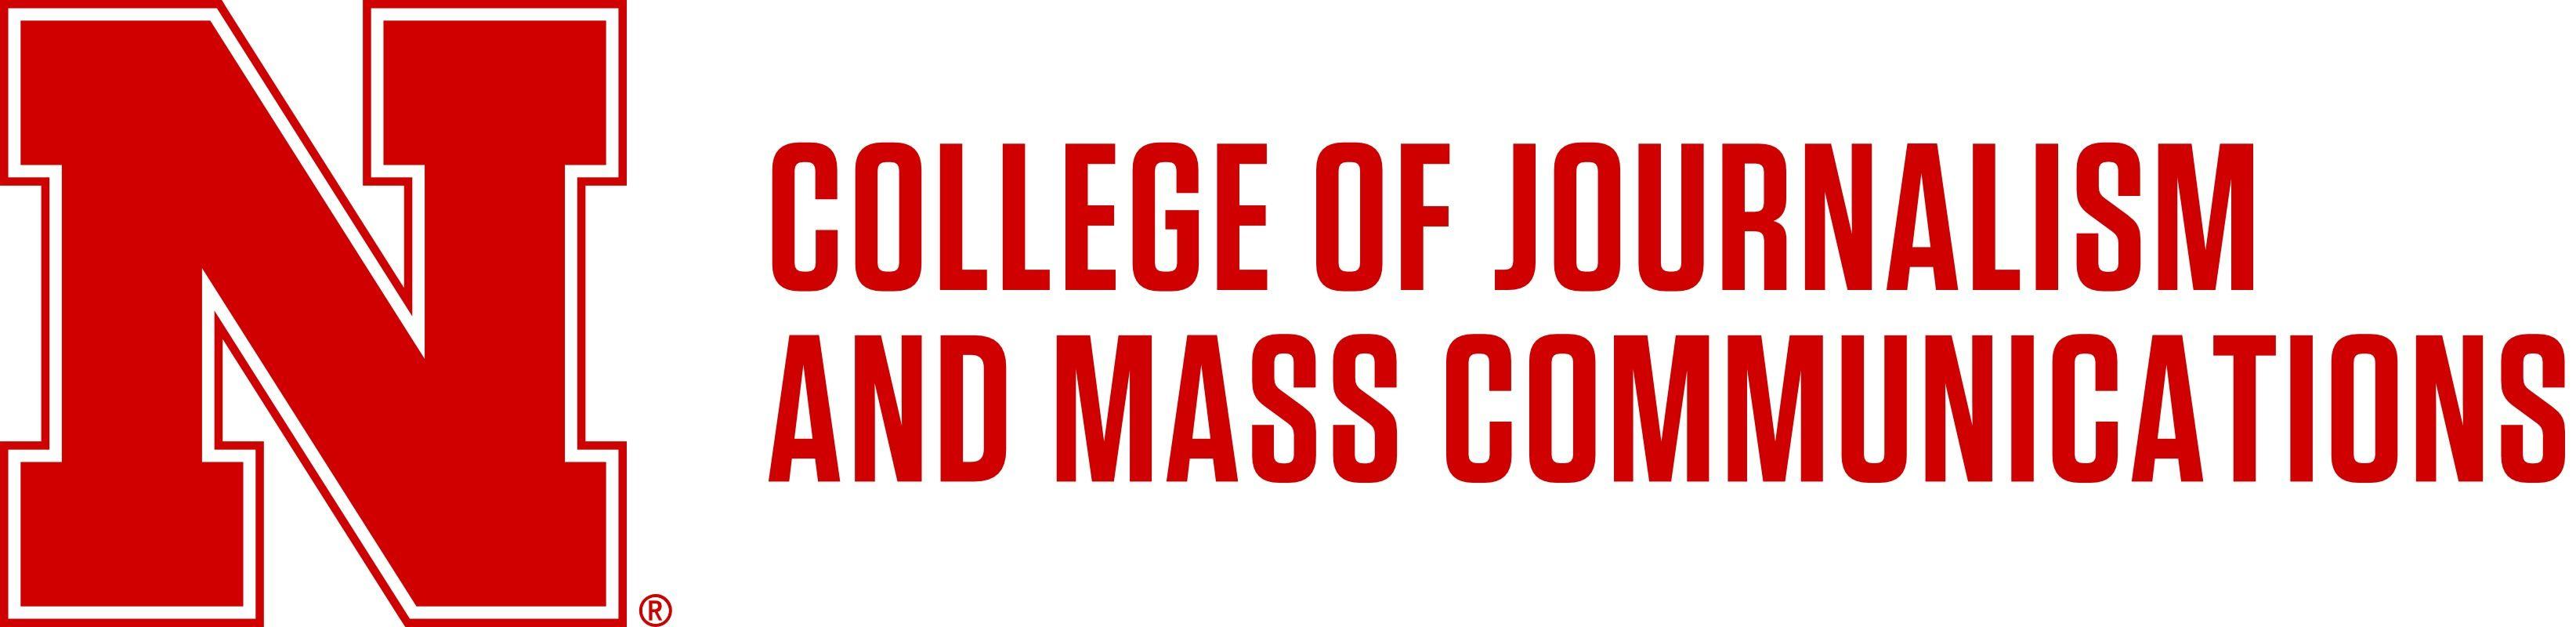 University of Nebraska- Lincoln College of Journalism and Mass Communications